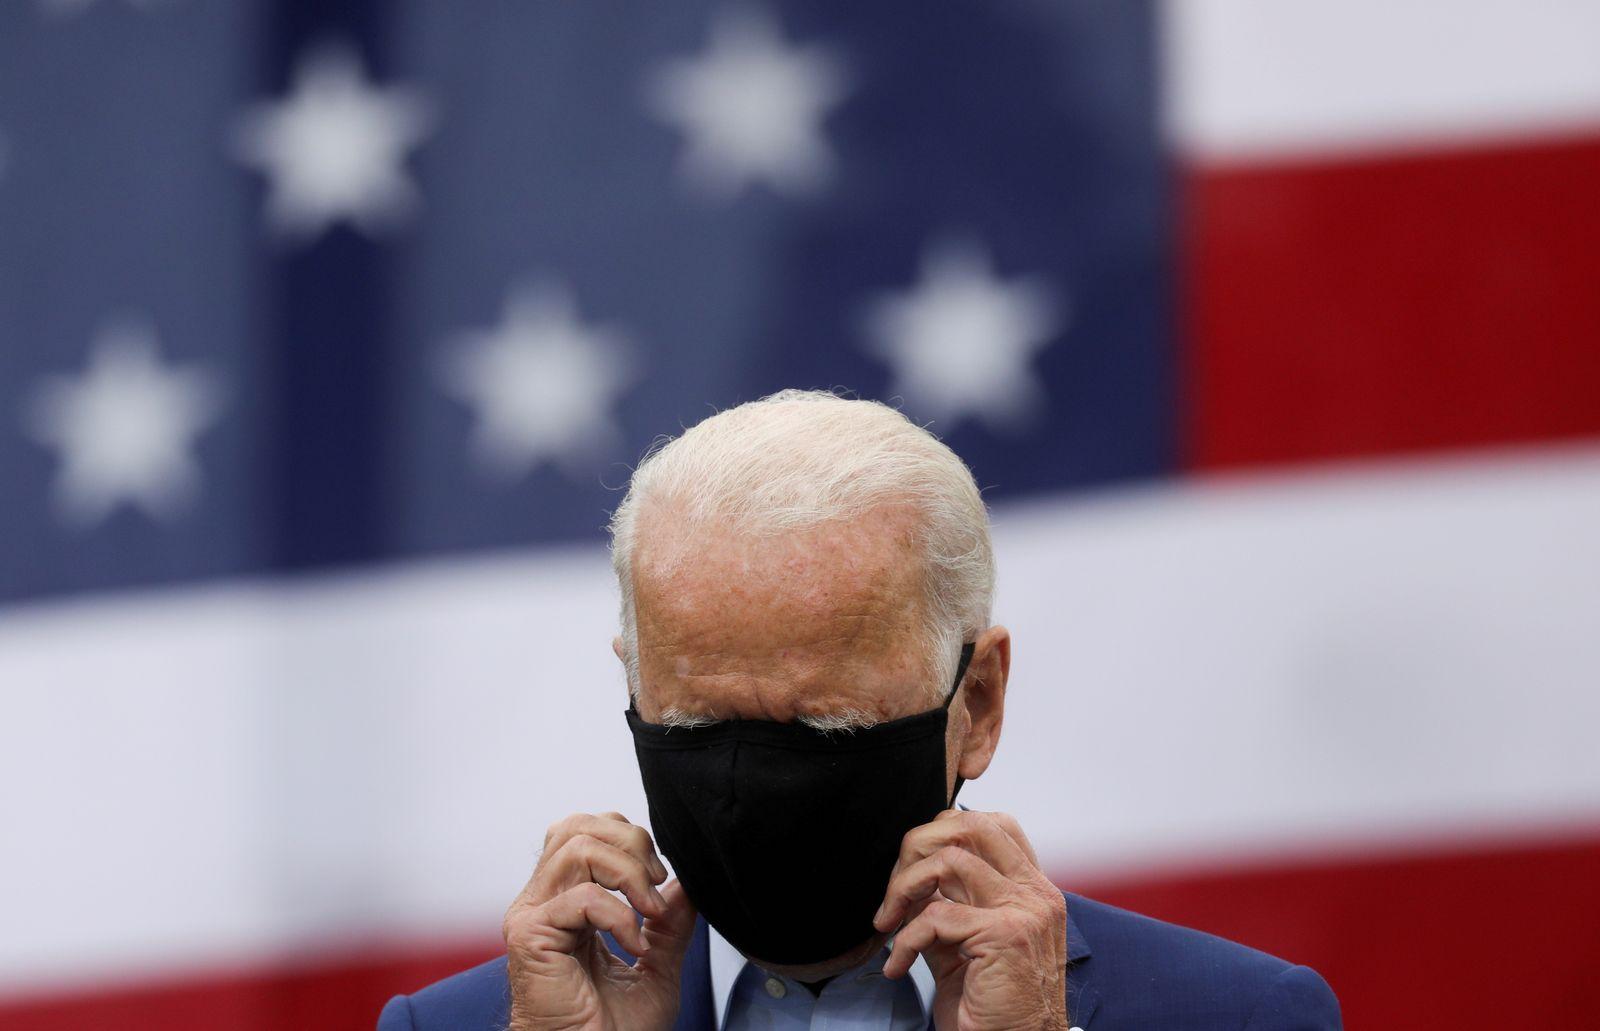 Democratic U.S. presidential nominee Joe Biden campaigns in Warren, Michigan